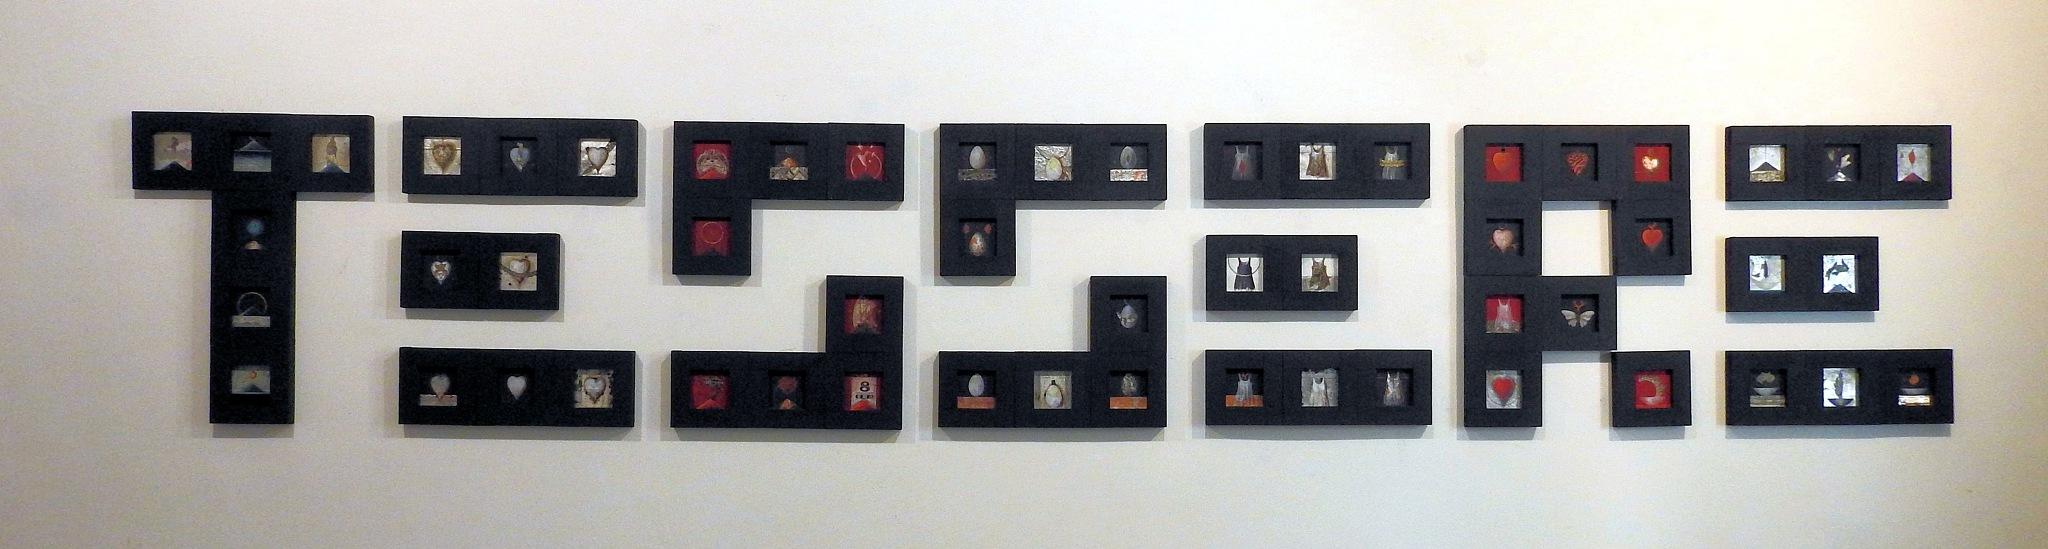 P.A.N. Napoli - Gabriella Gorini - TESSERE - 8 by Arnaldo De Lisio